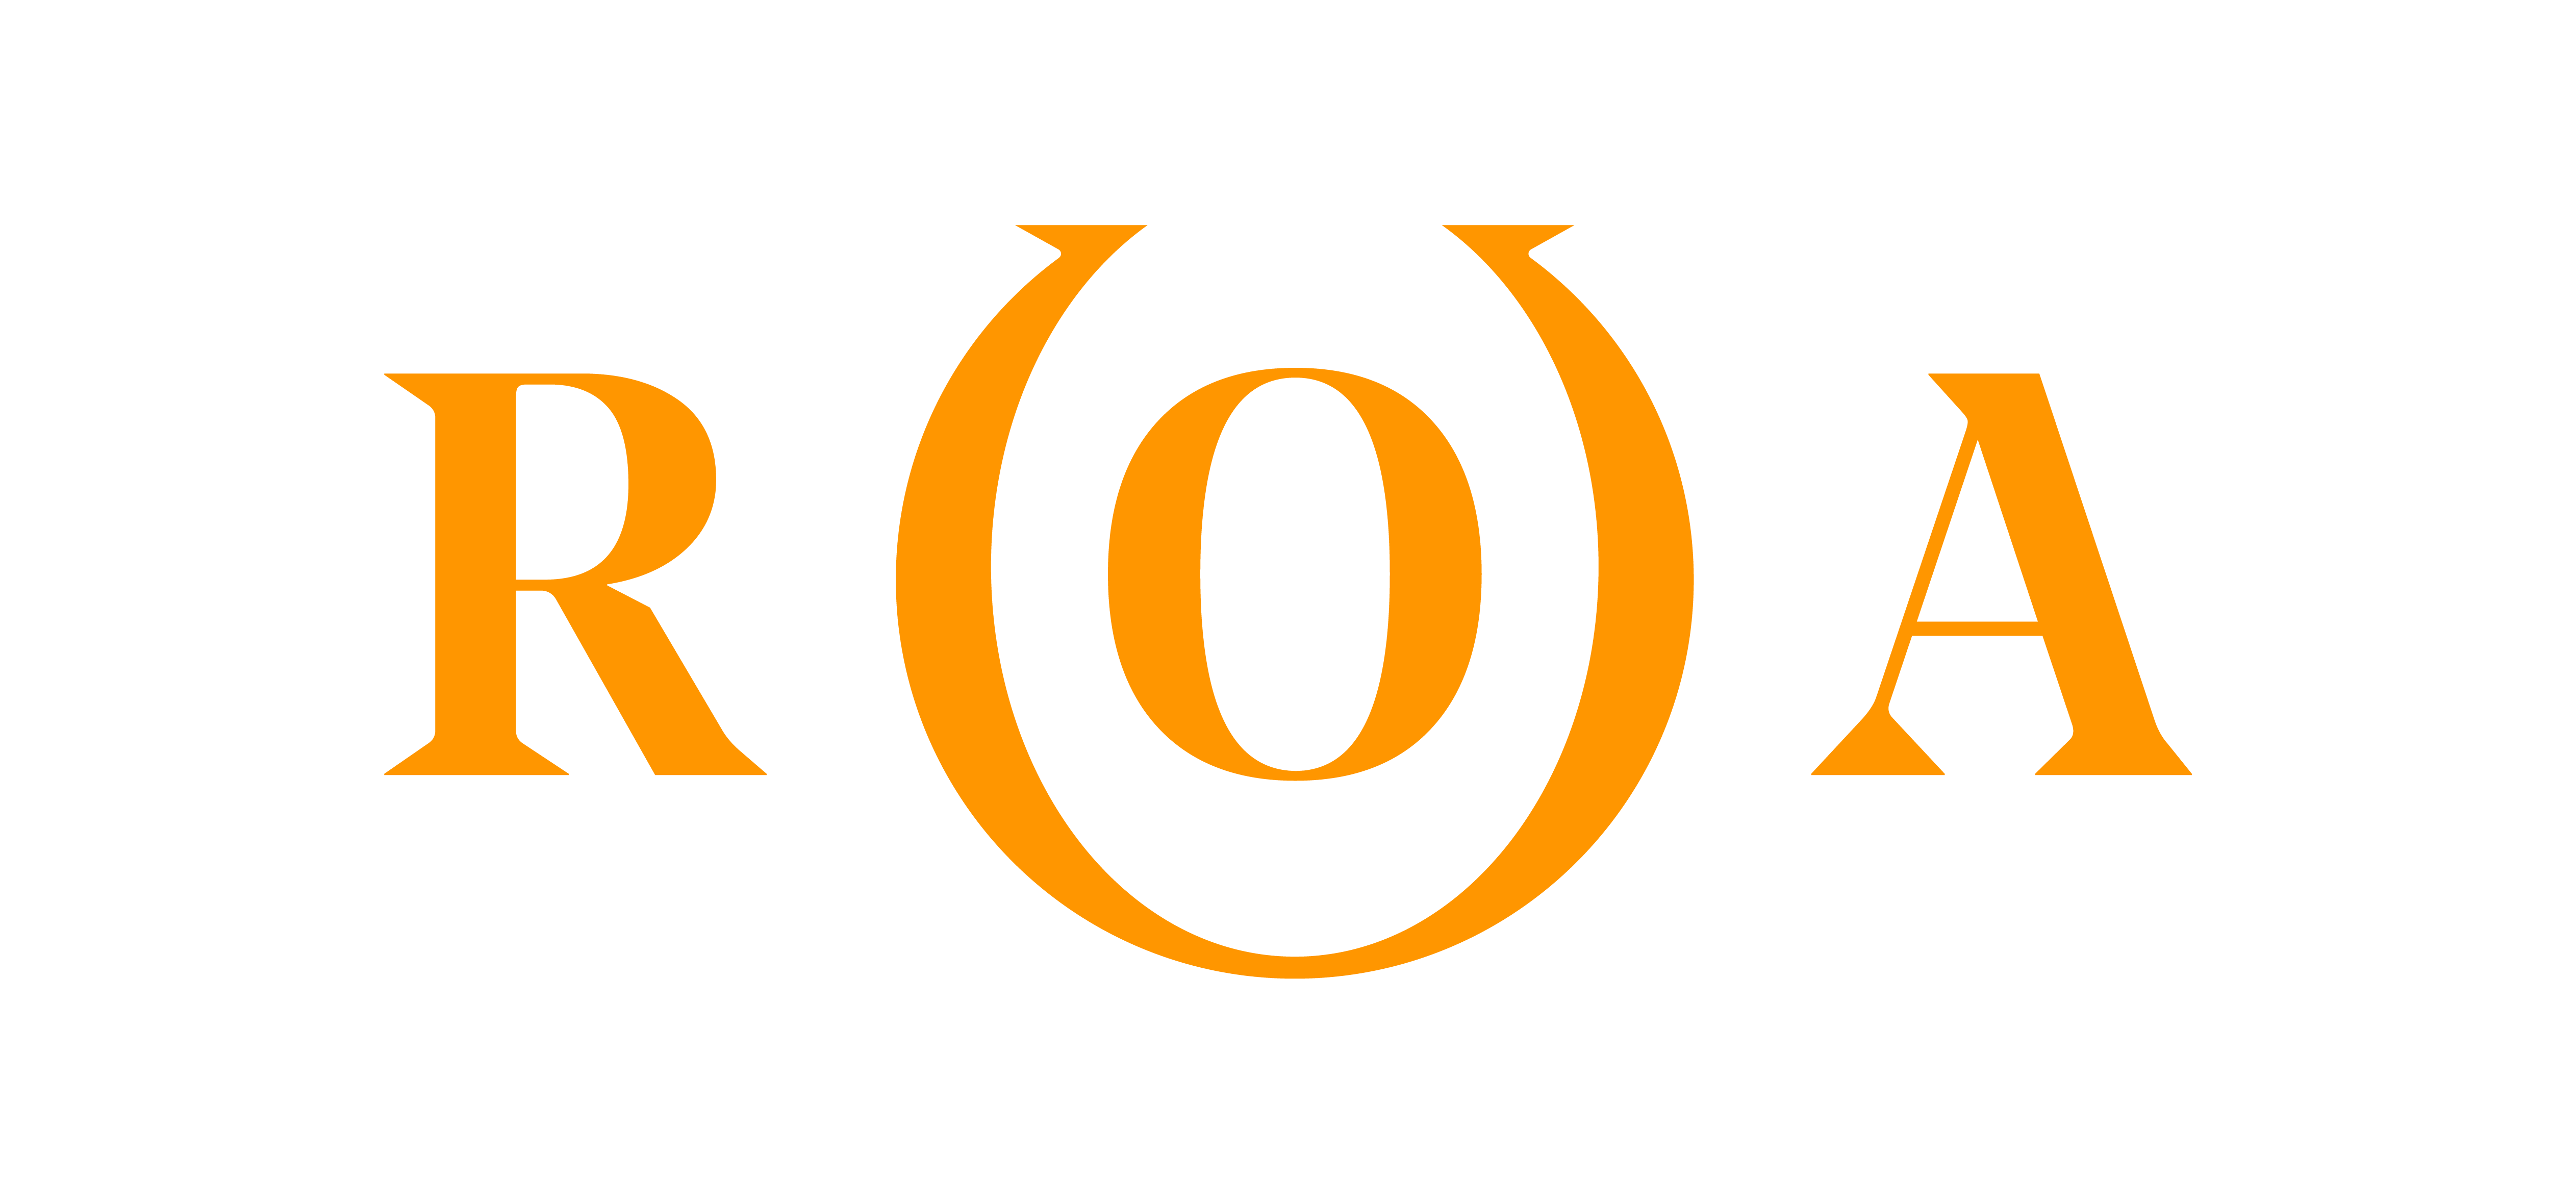 Racehorse Owners Association (ROA) logo